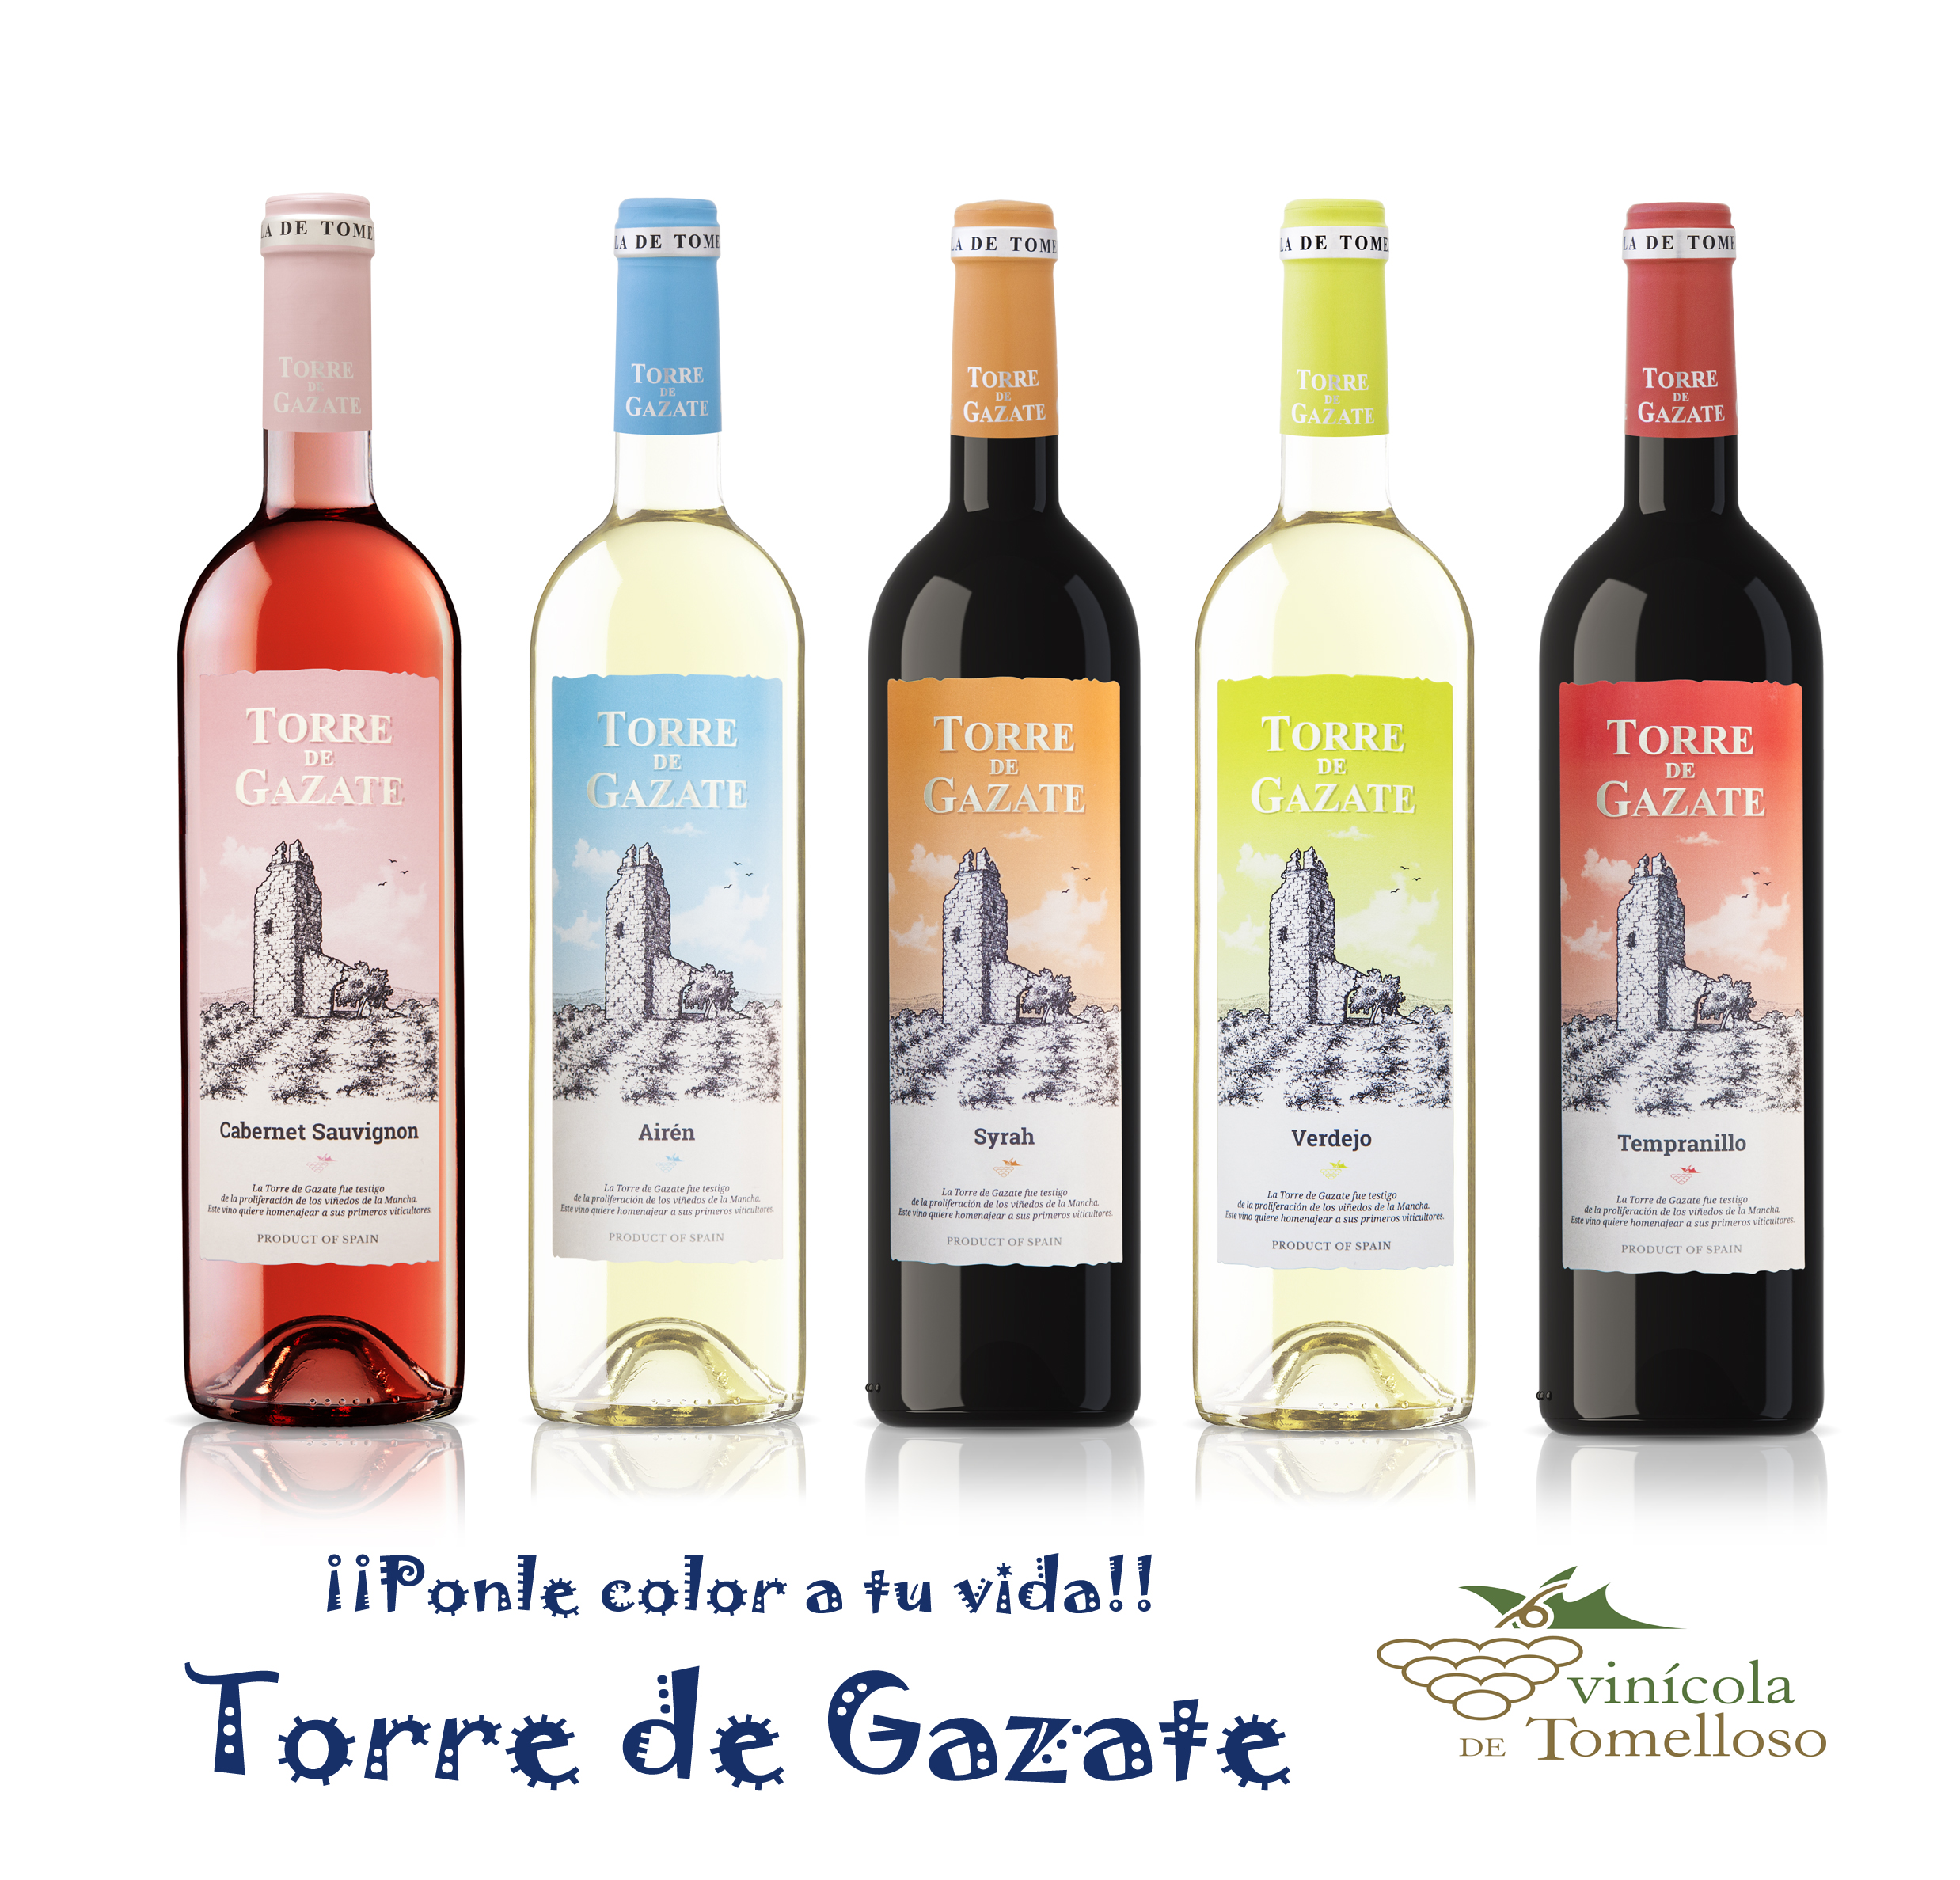 vinos jovenes nueva etiqueta12-04-17 jaime